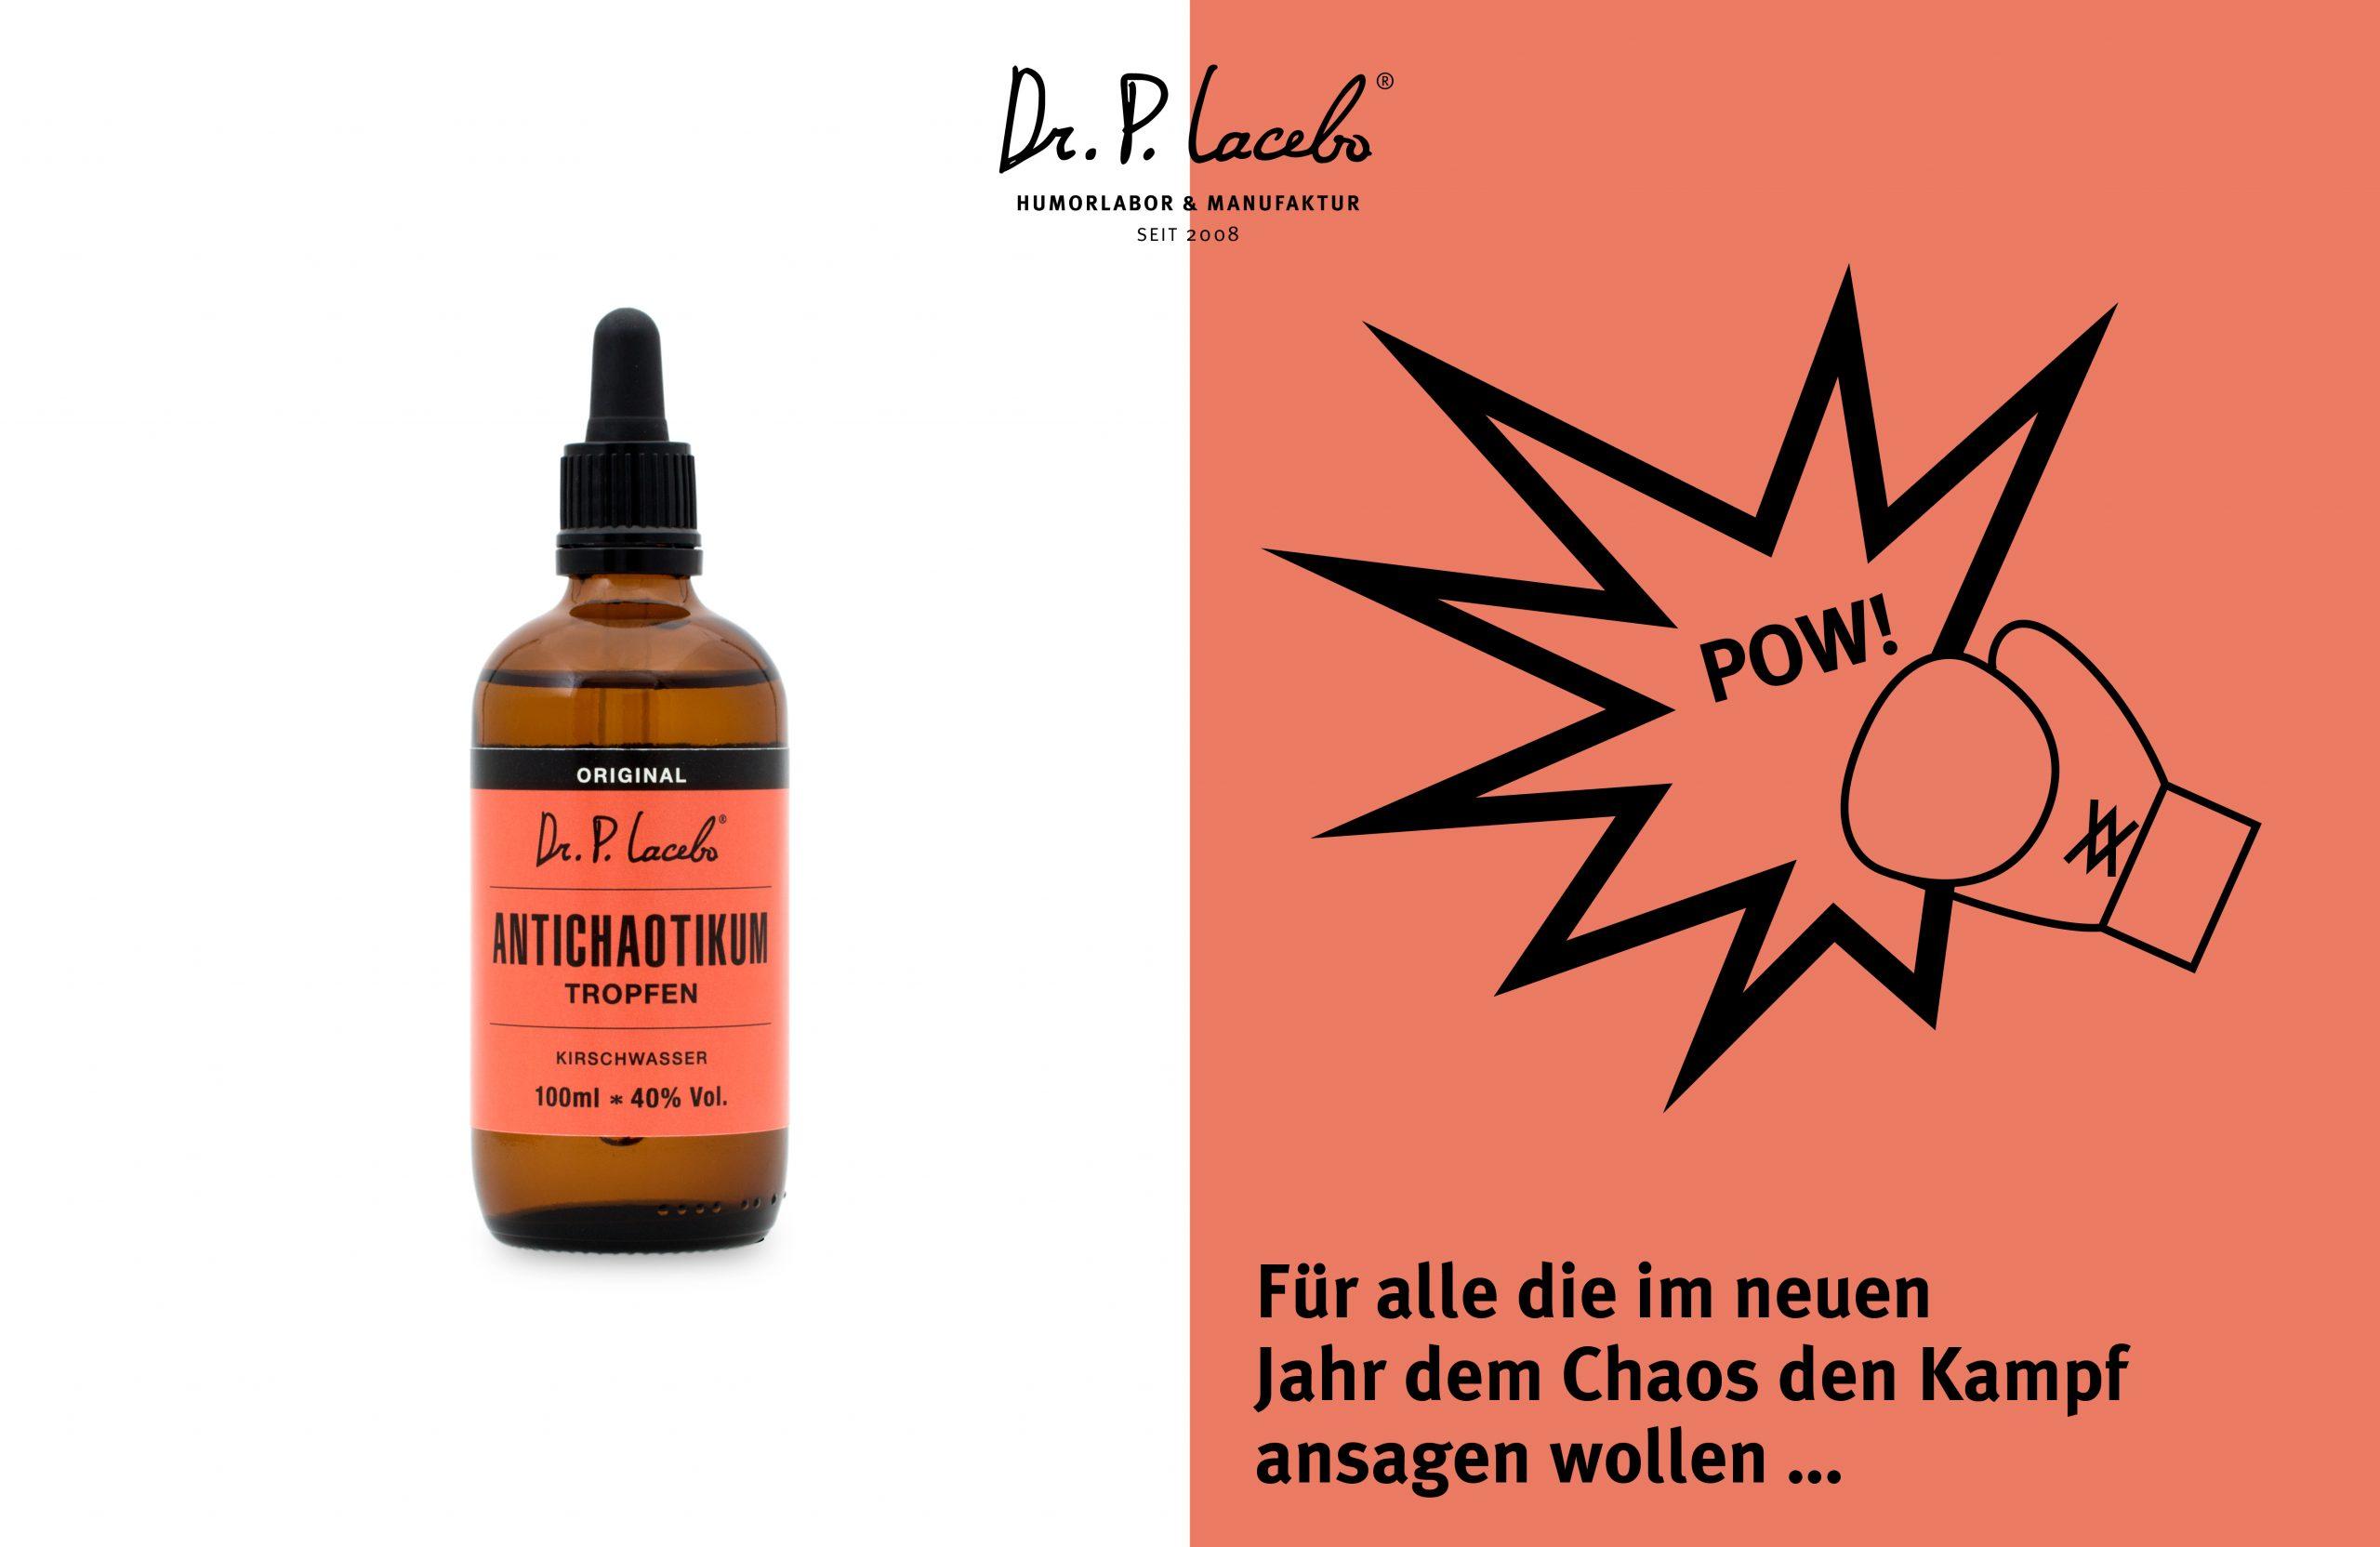 Dr_P_Lacebo4